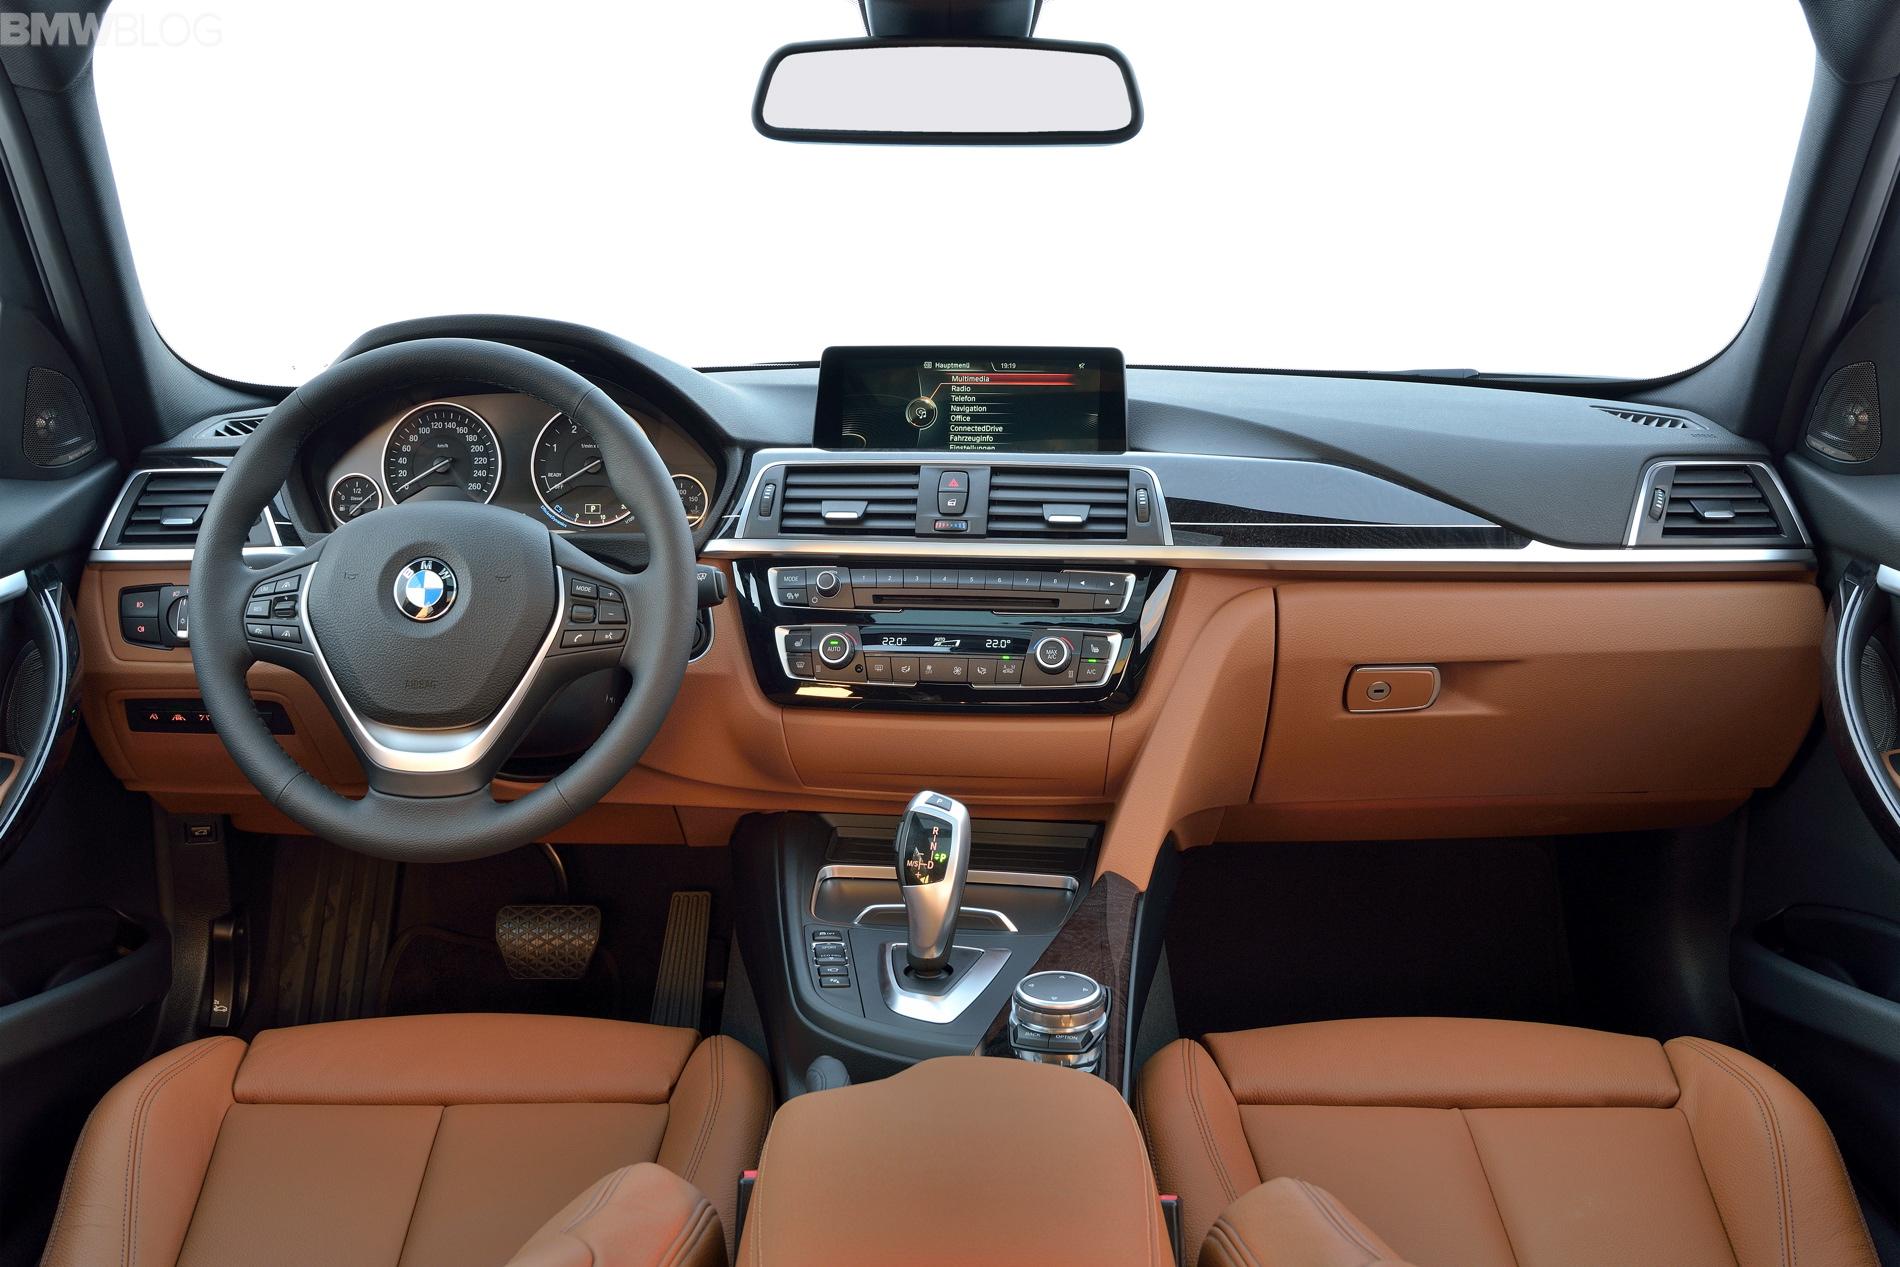 BMW 3 Series VI (F3x) 2011 - 2016 Station wagon 5 door #8